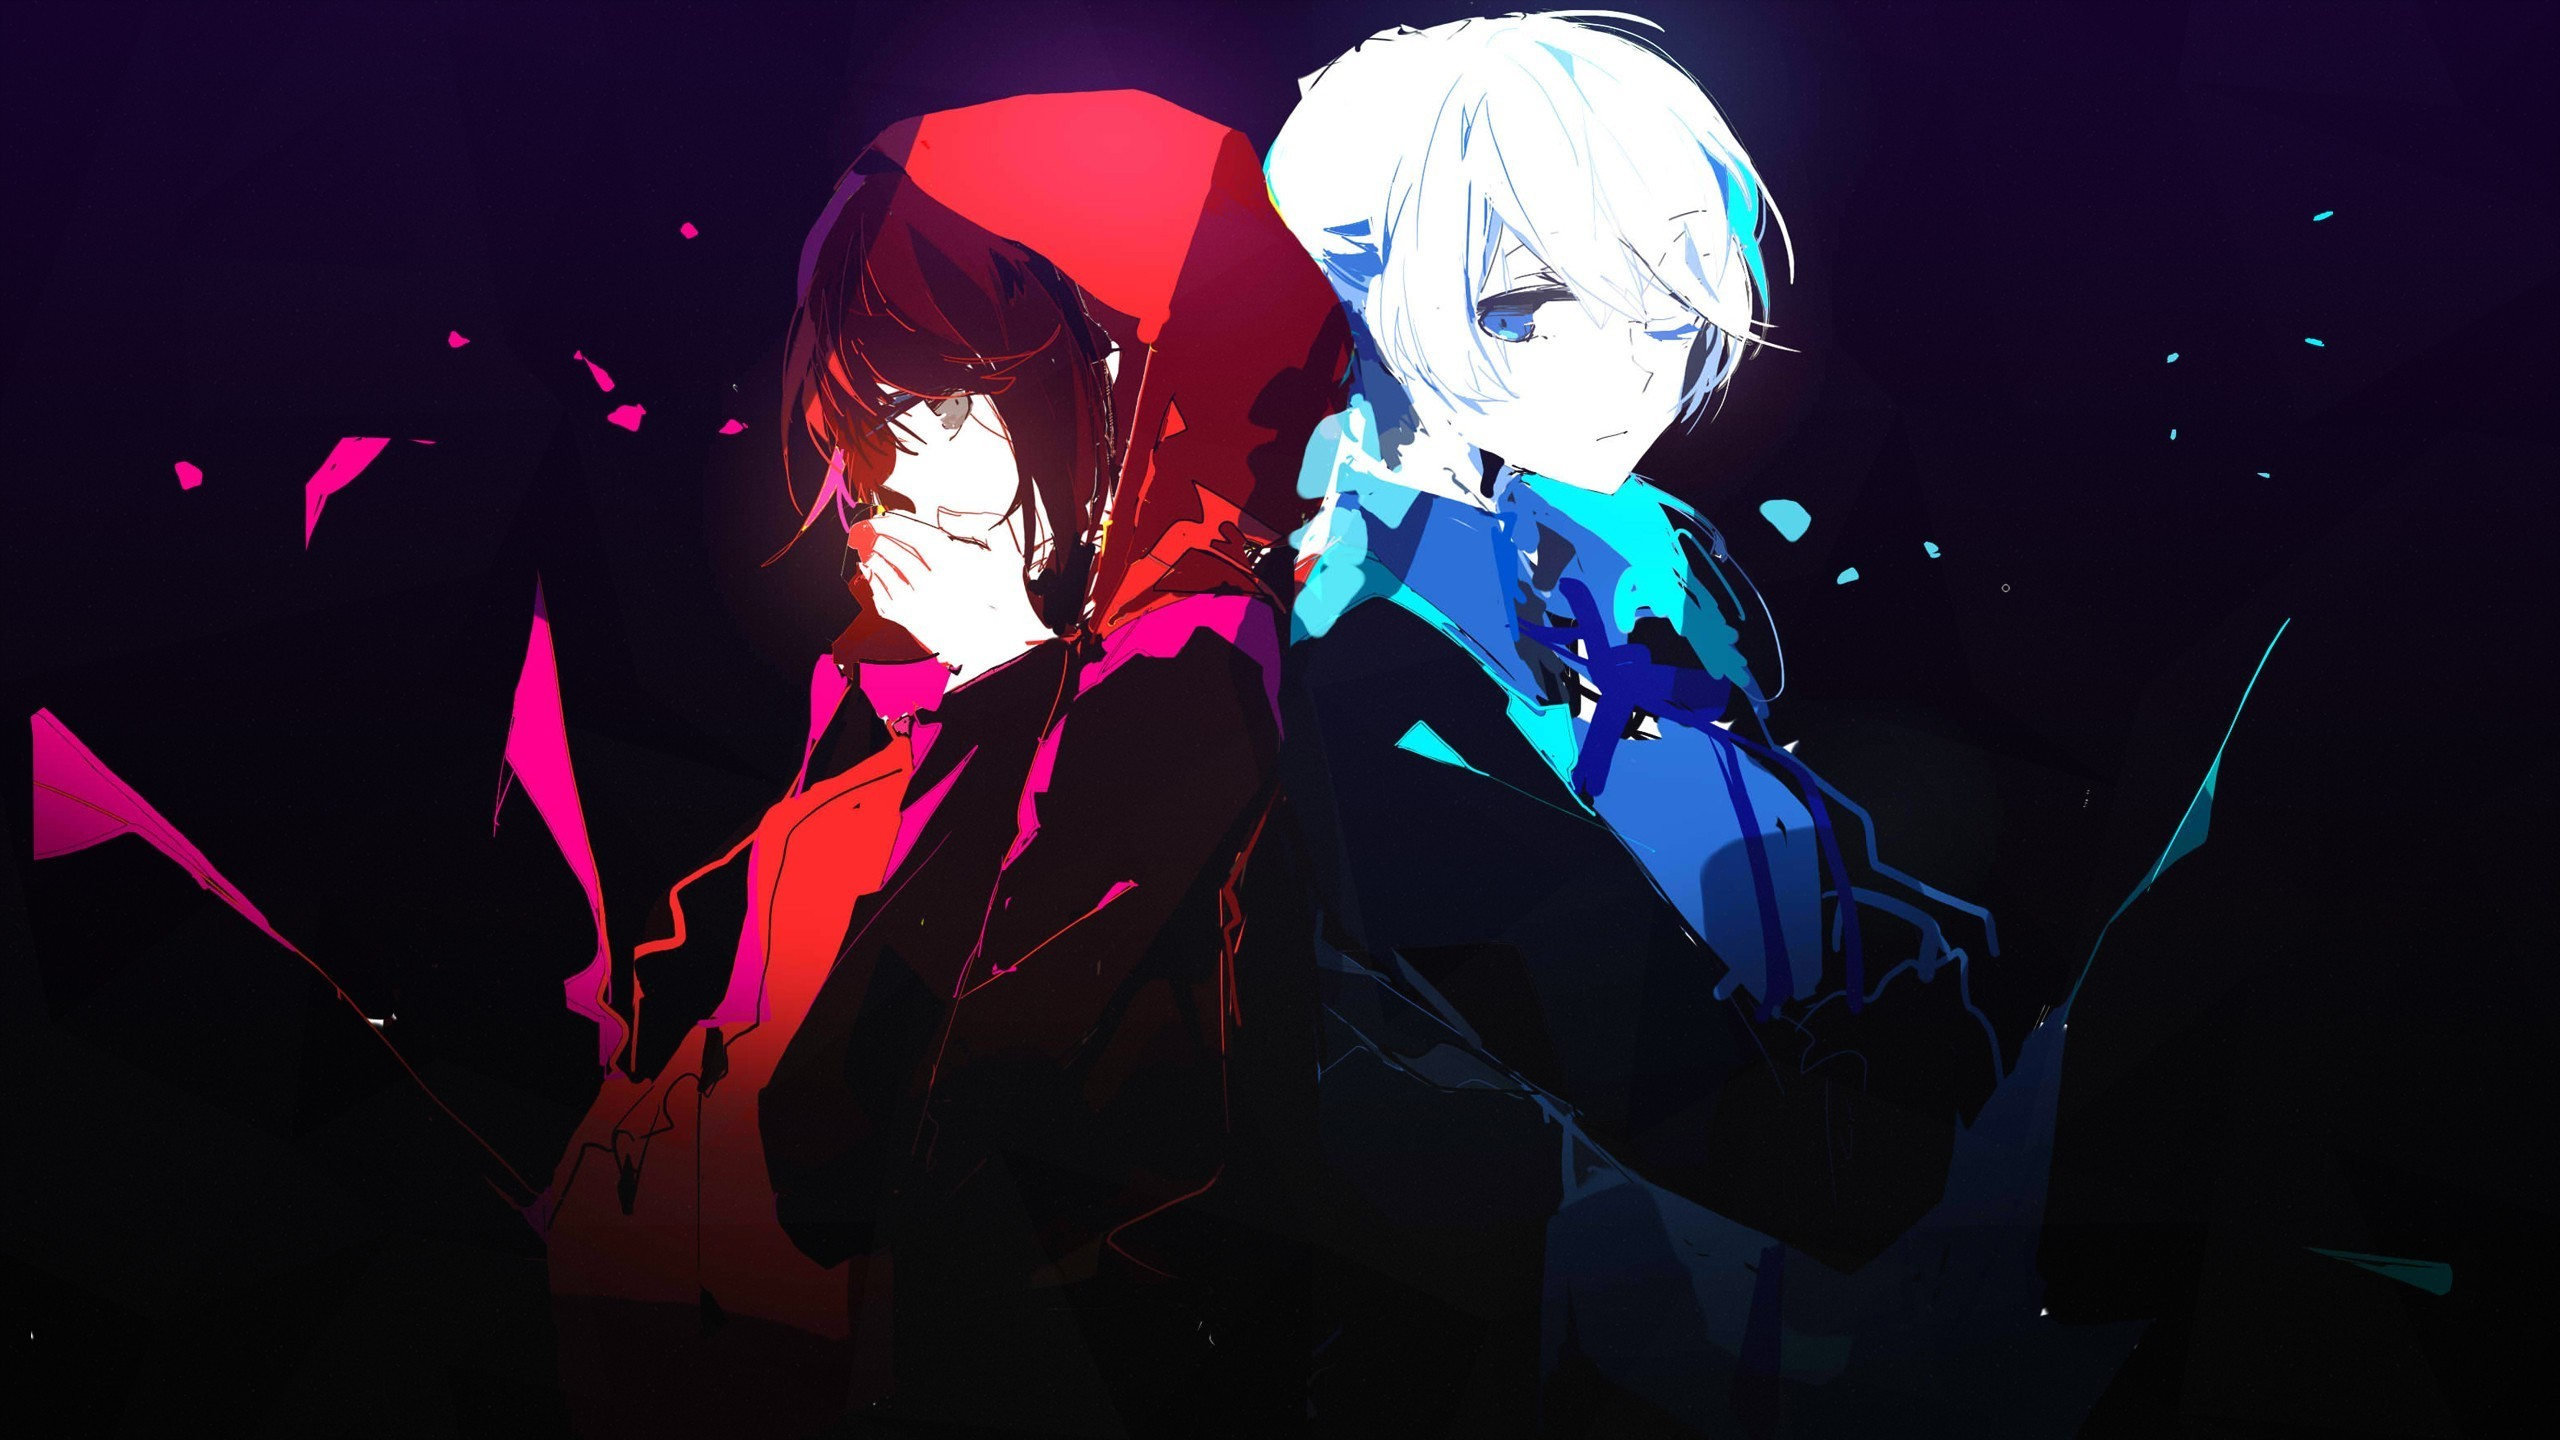 Res: 2560x1440, Anime RWBY wallpapers (Desktop, Phone, Tablet) - Awesome Desktop .